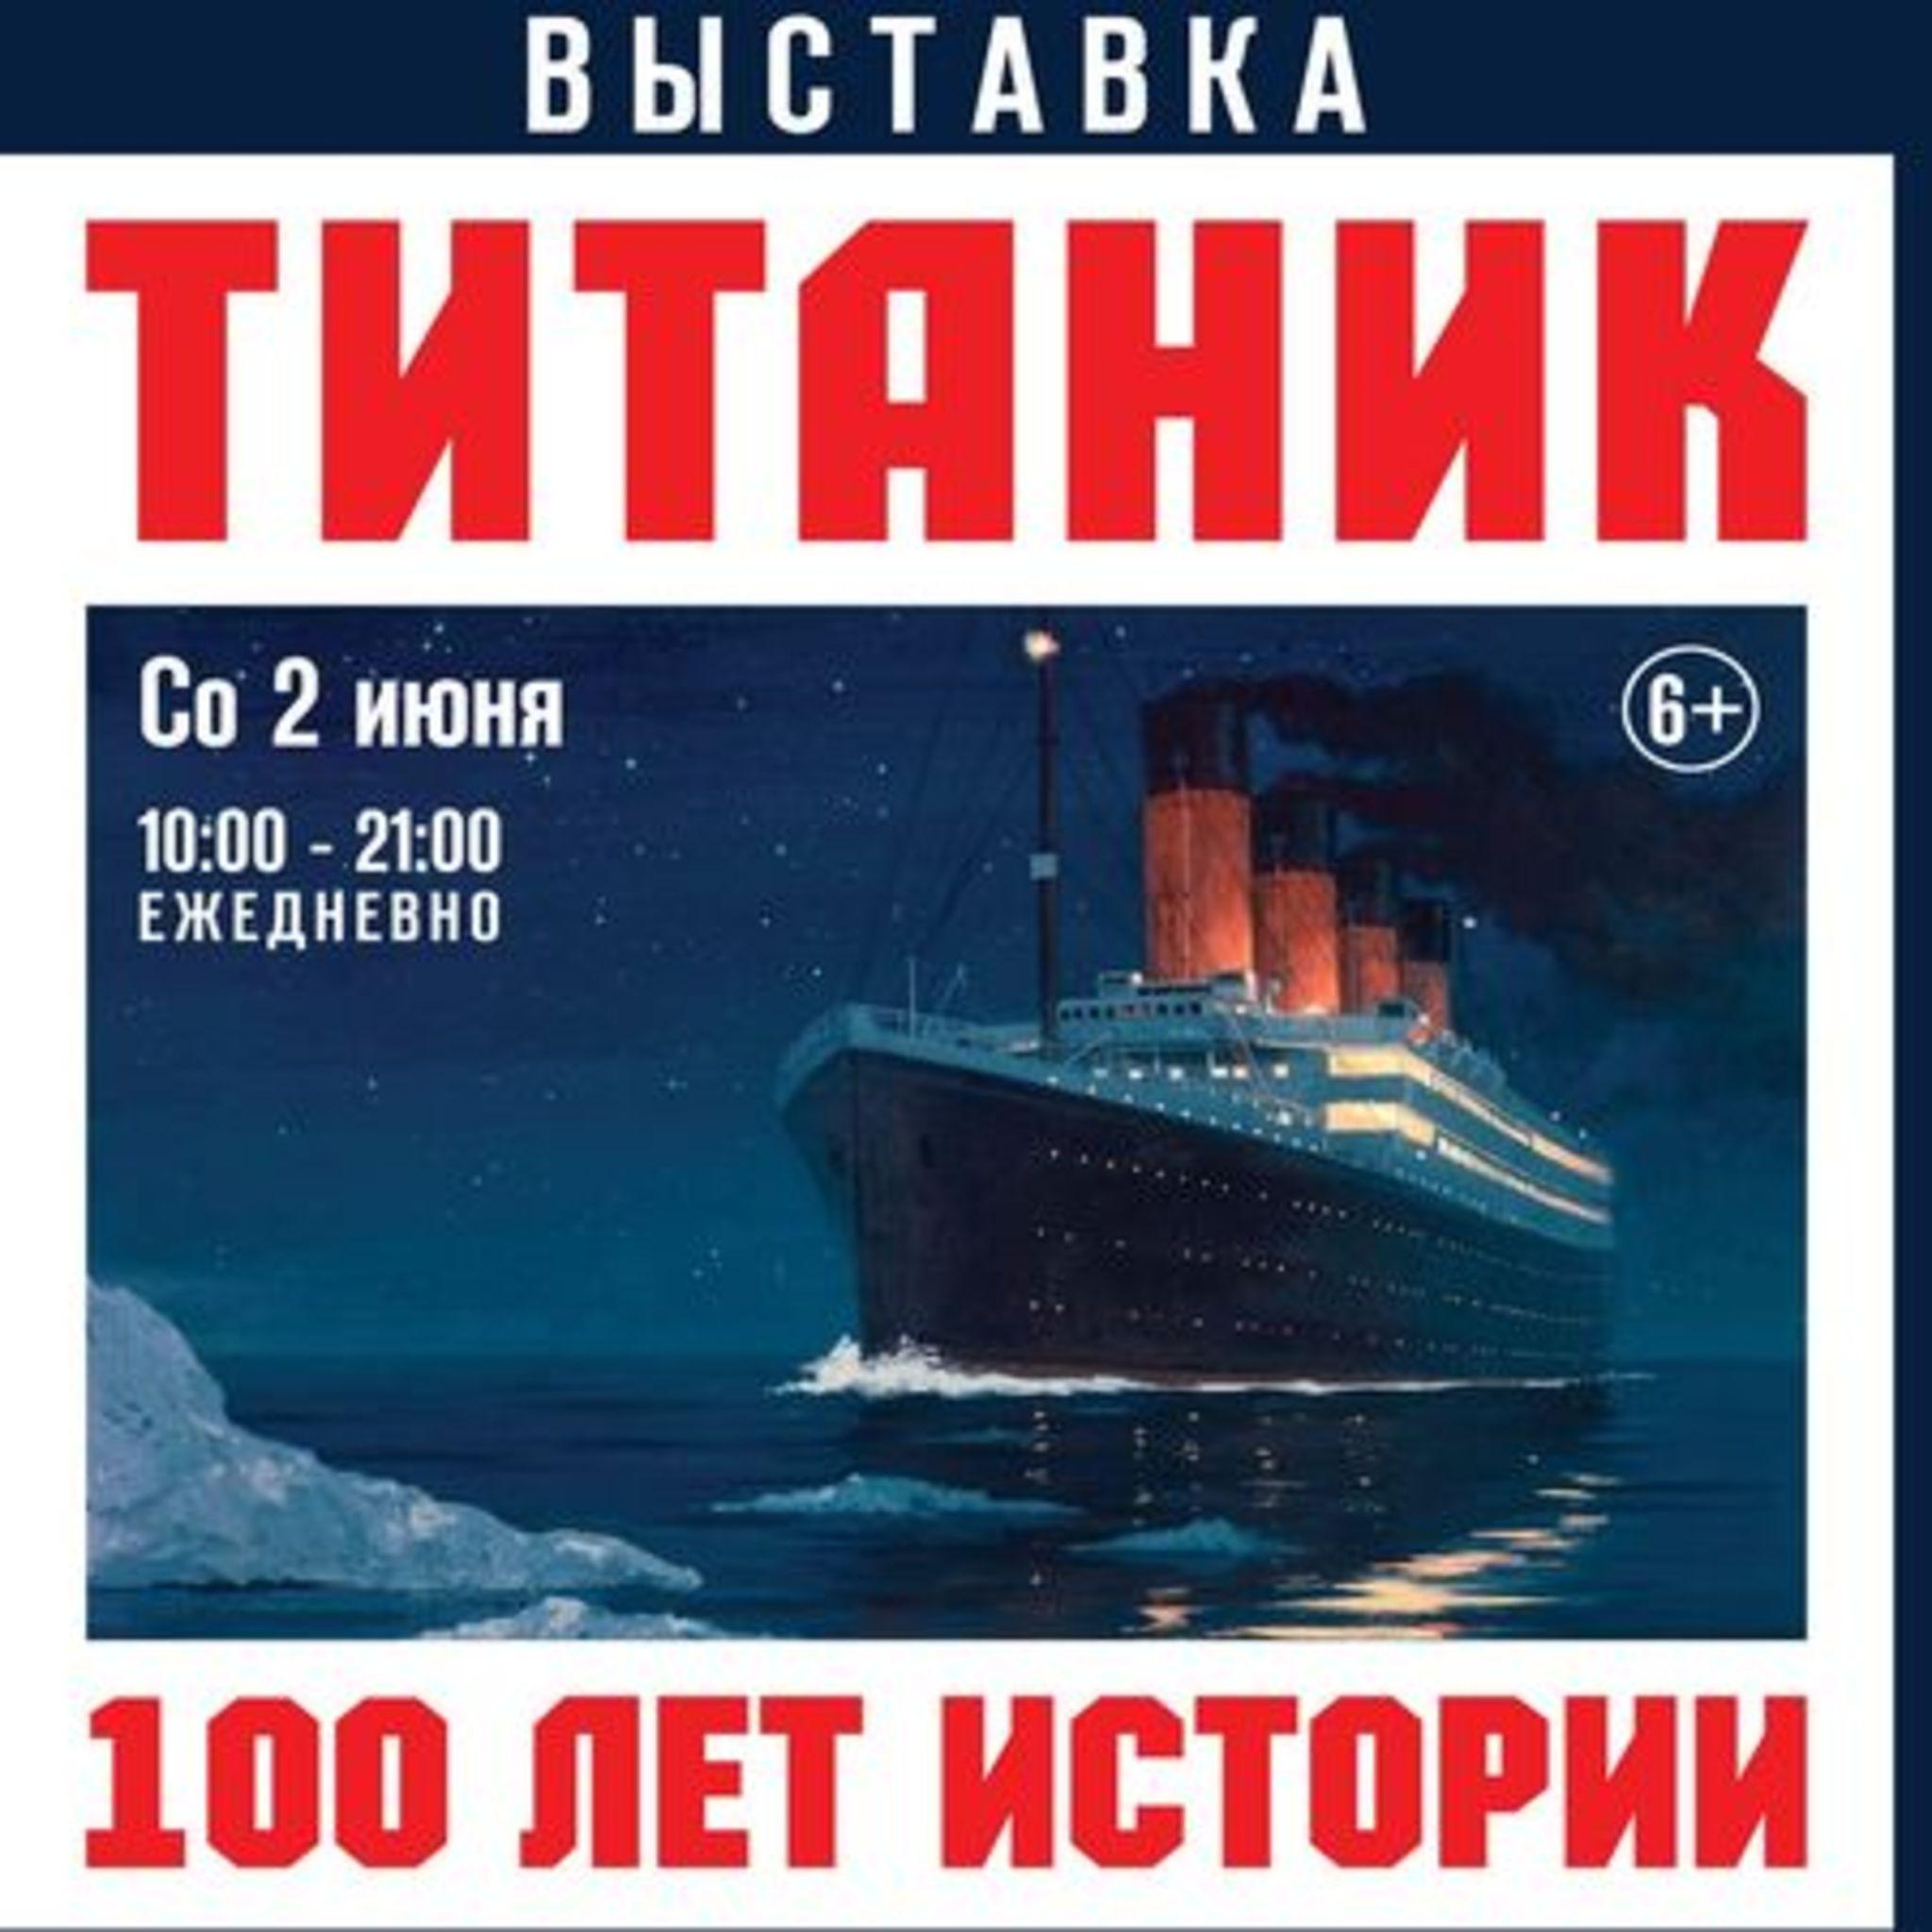 Titanic Exhibition. 100 years of history